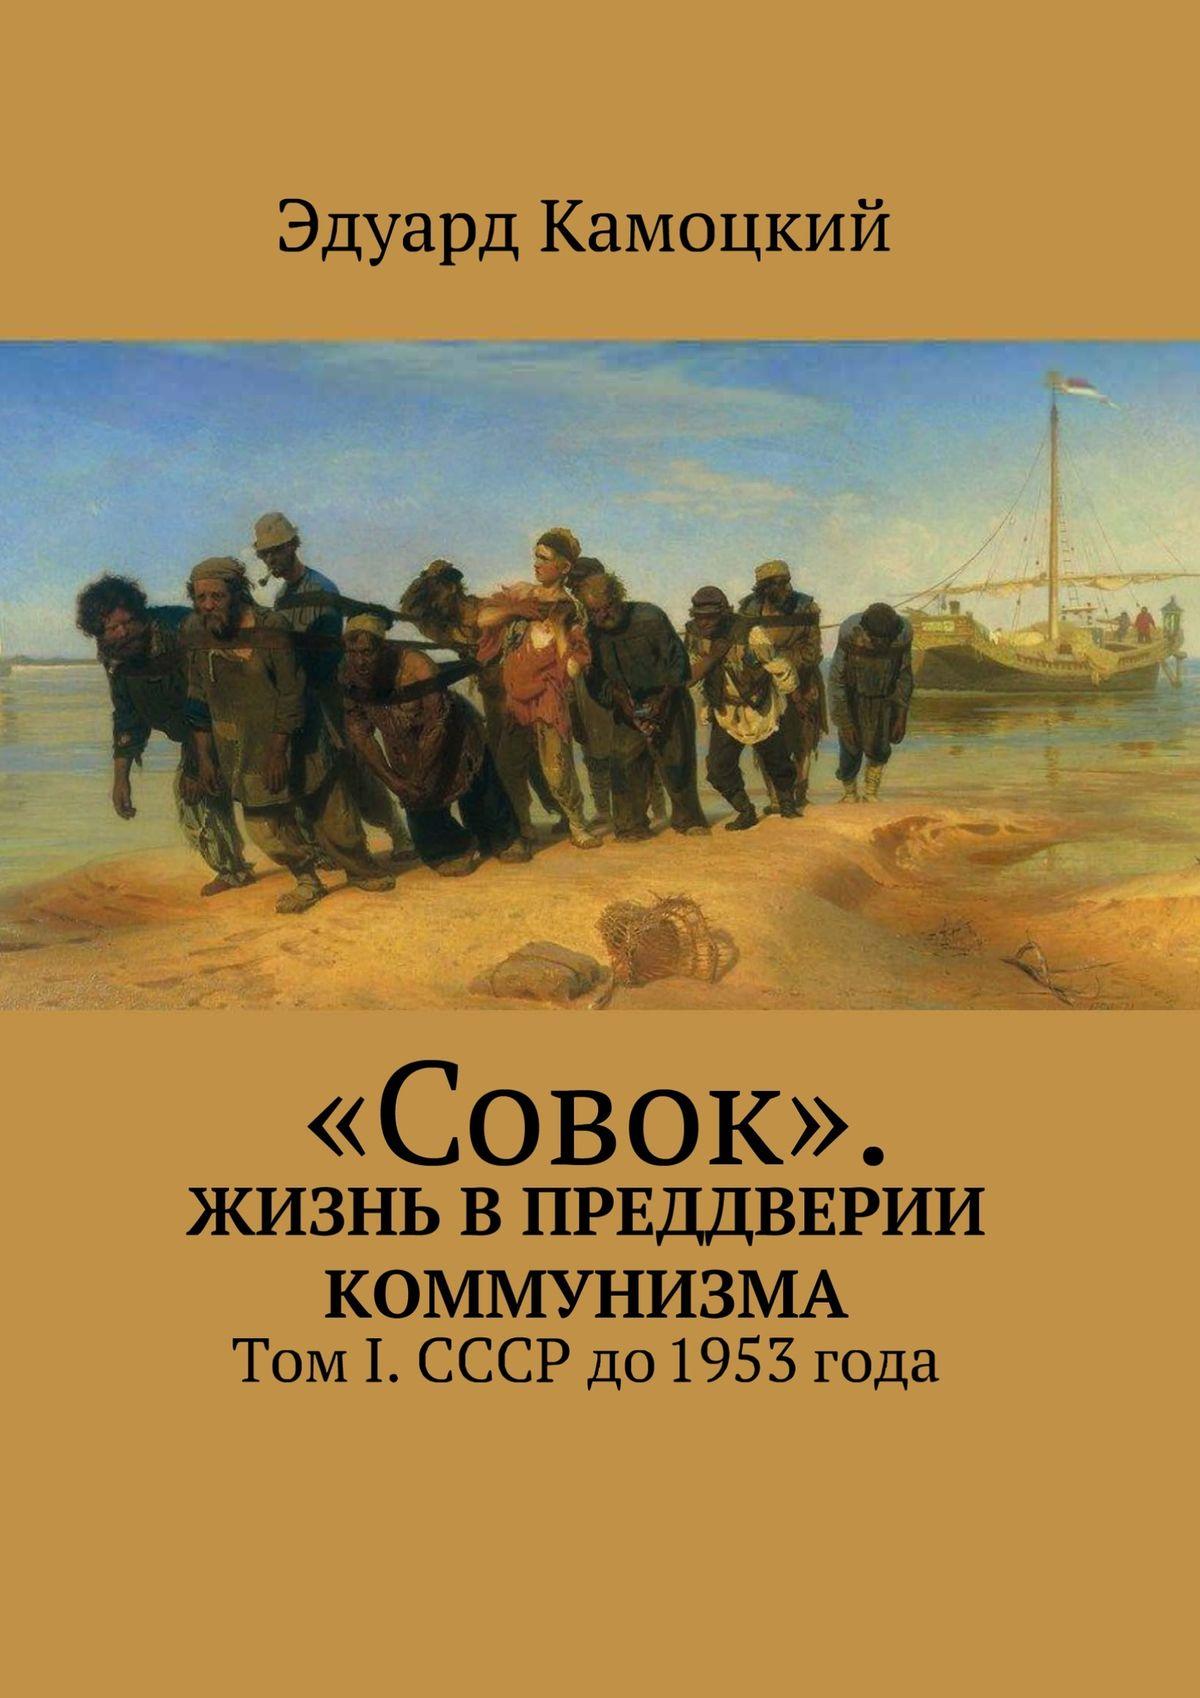 Эдуард Камоцкий «Совок». Жизнь впреддверии коммунизма сигурд хёль моя вина